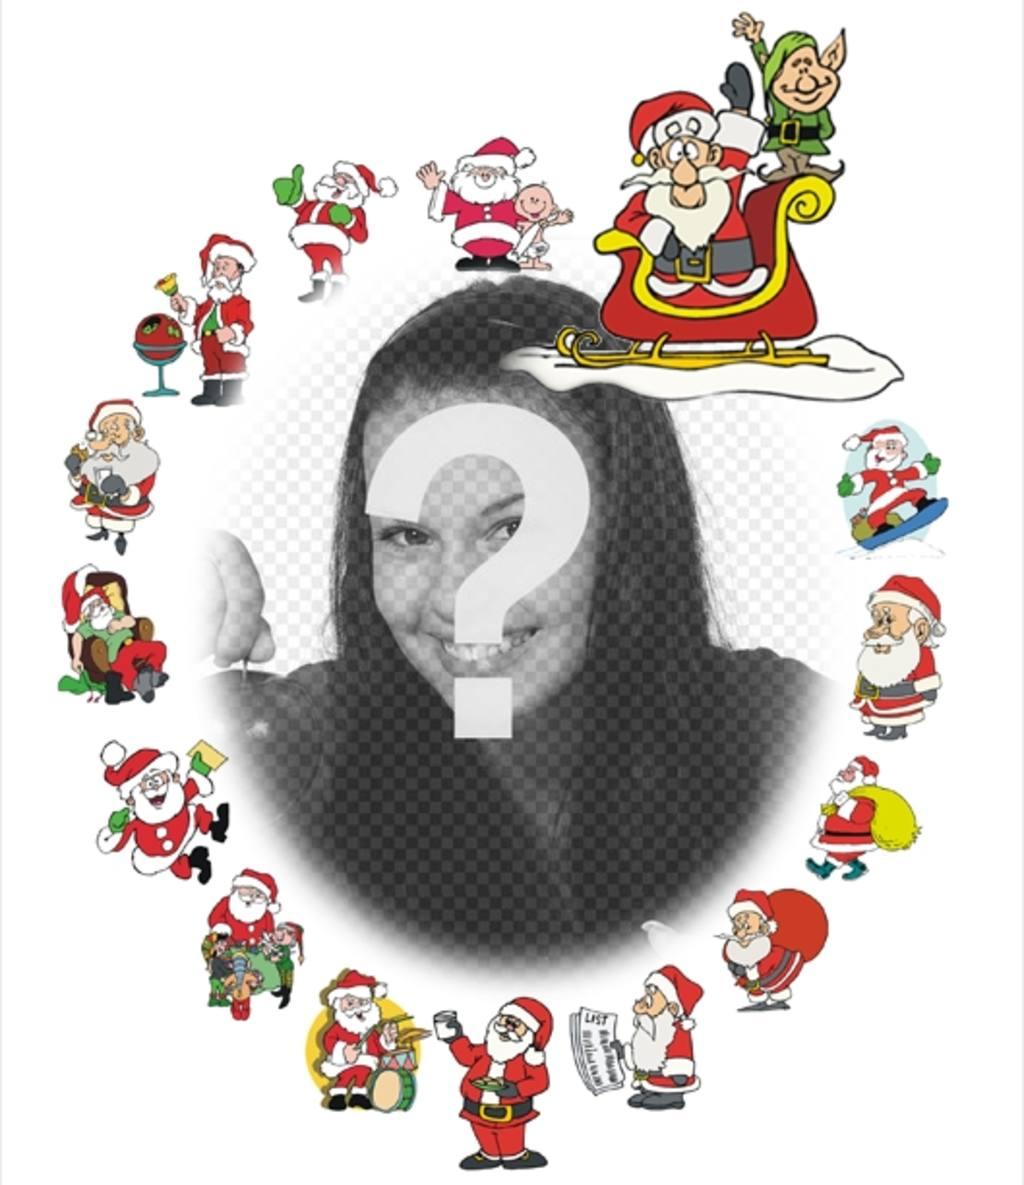 Nice frame with various Santa Claus to decorate photos